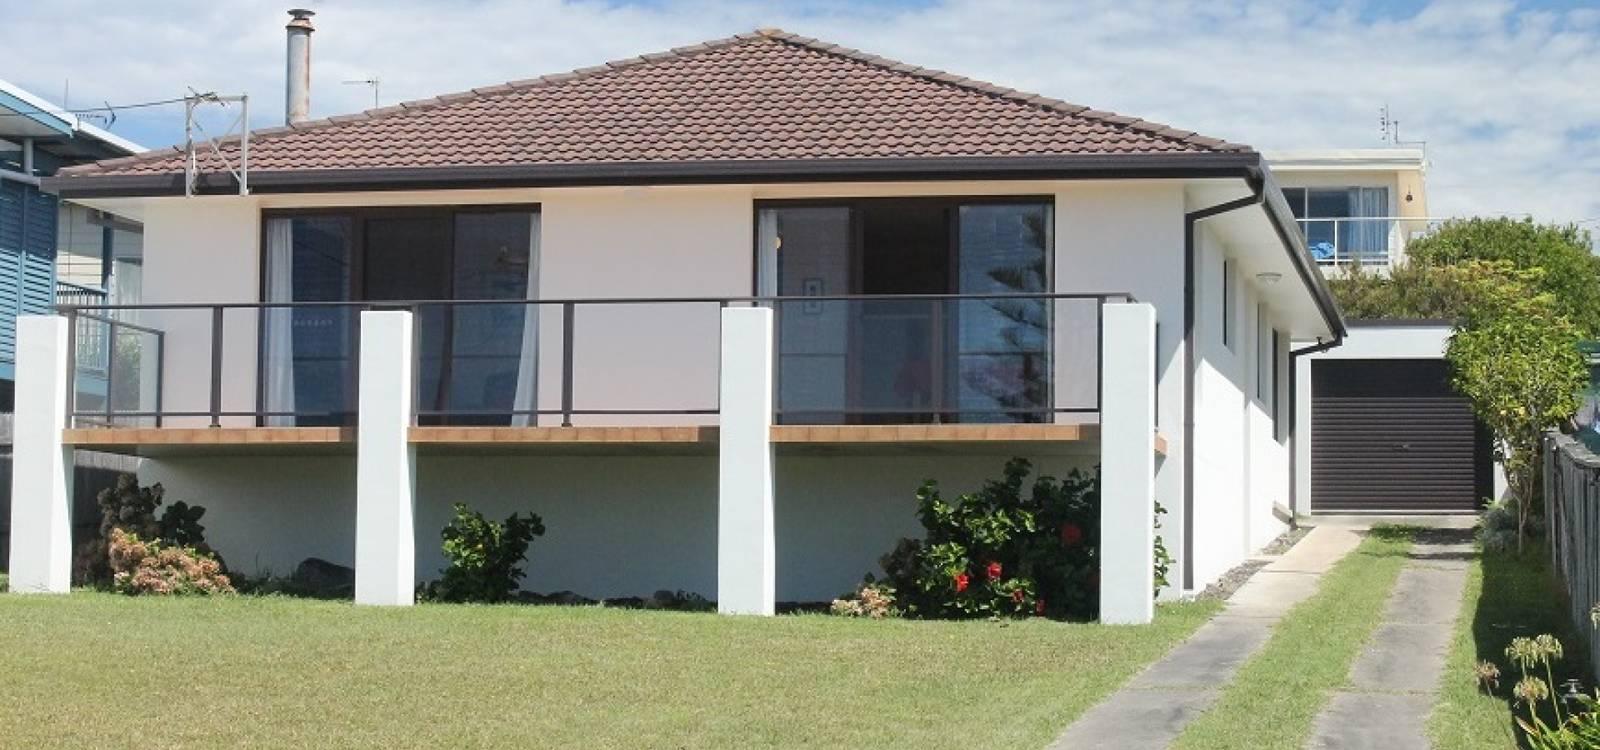 81 Tuross Boulevard TUROSS HEAD, NSW 2537 - photo 1